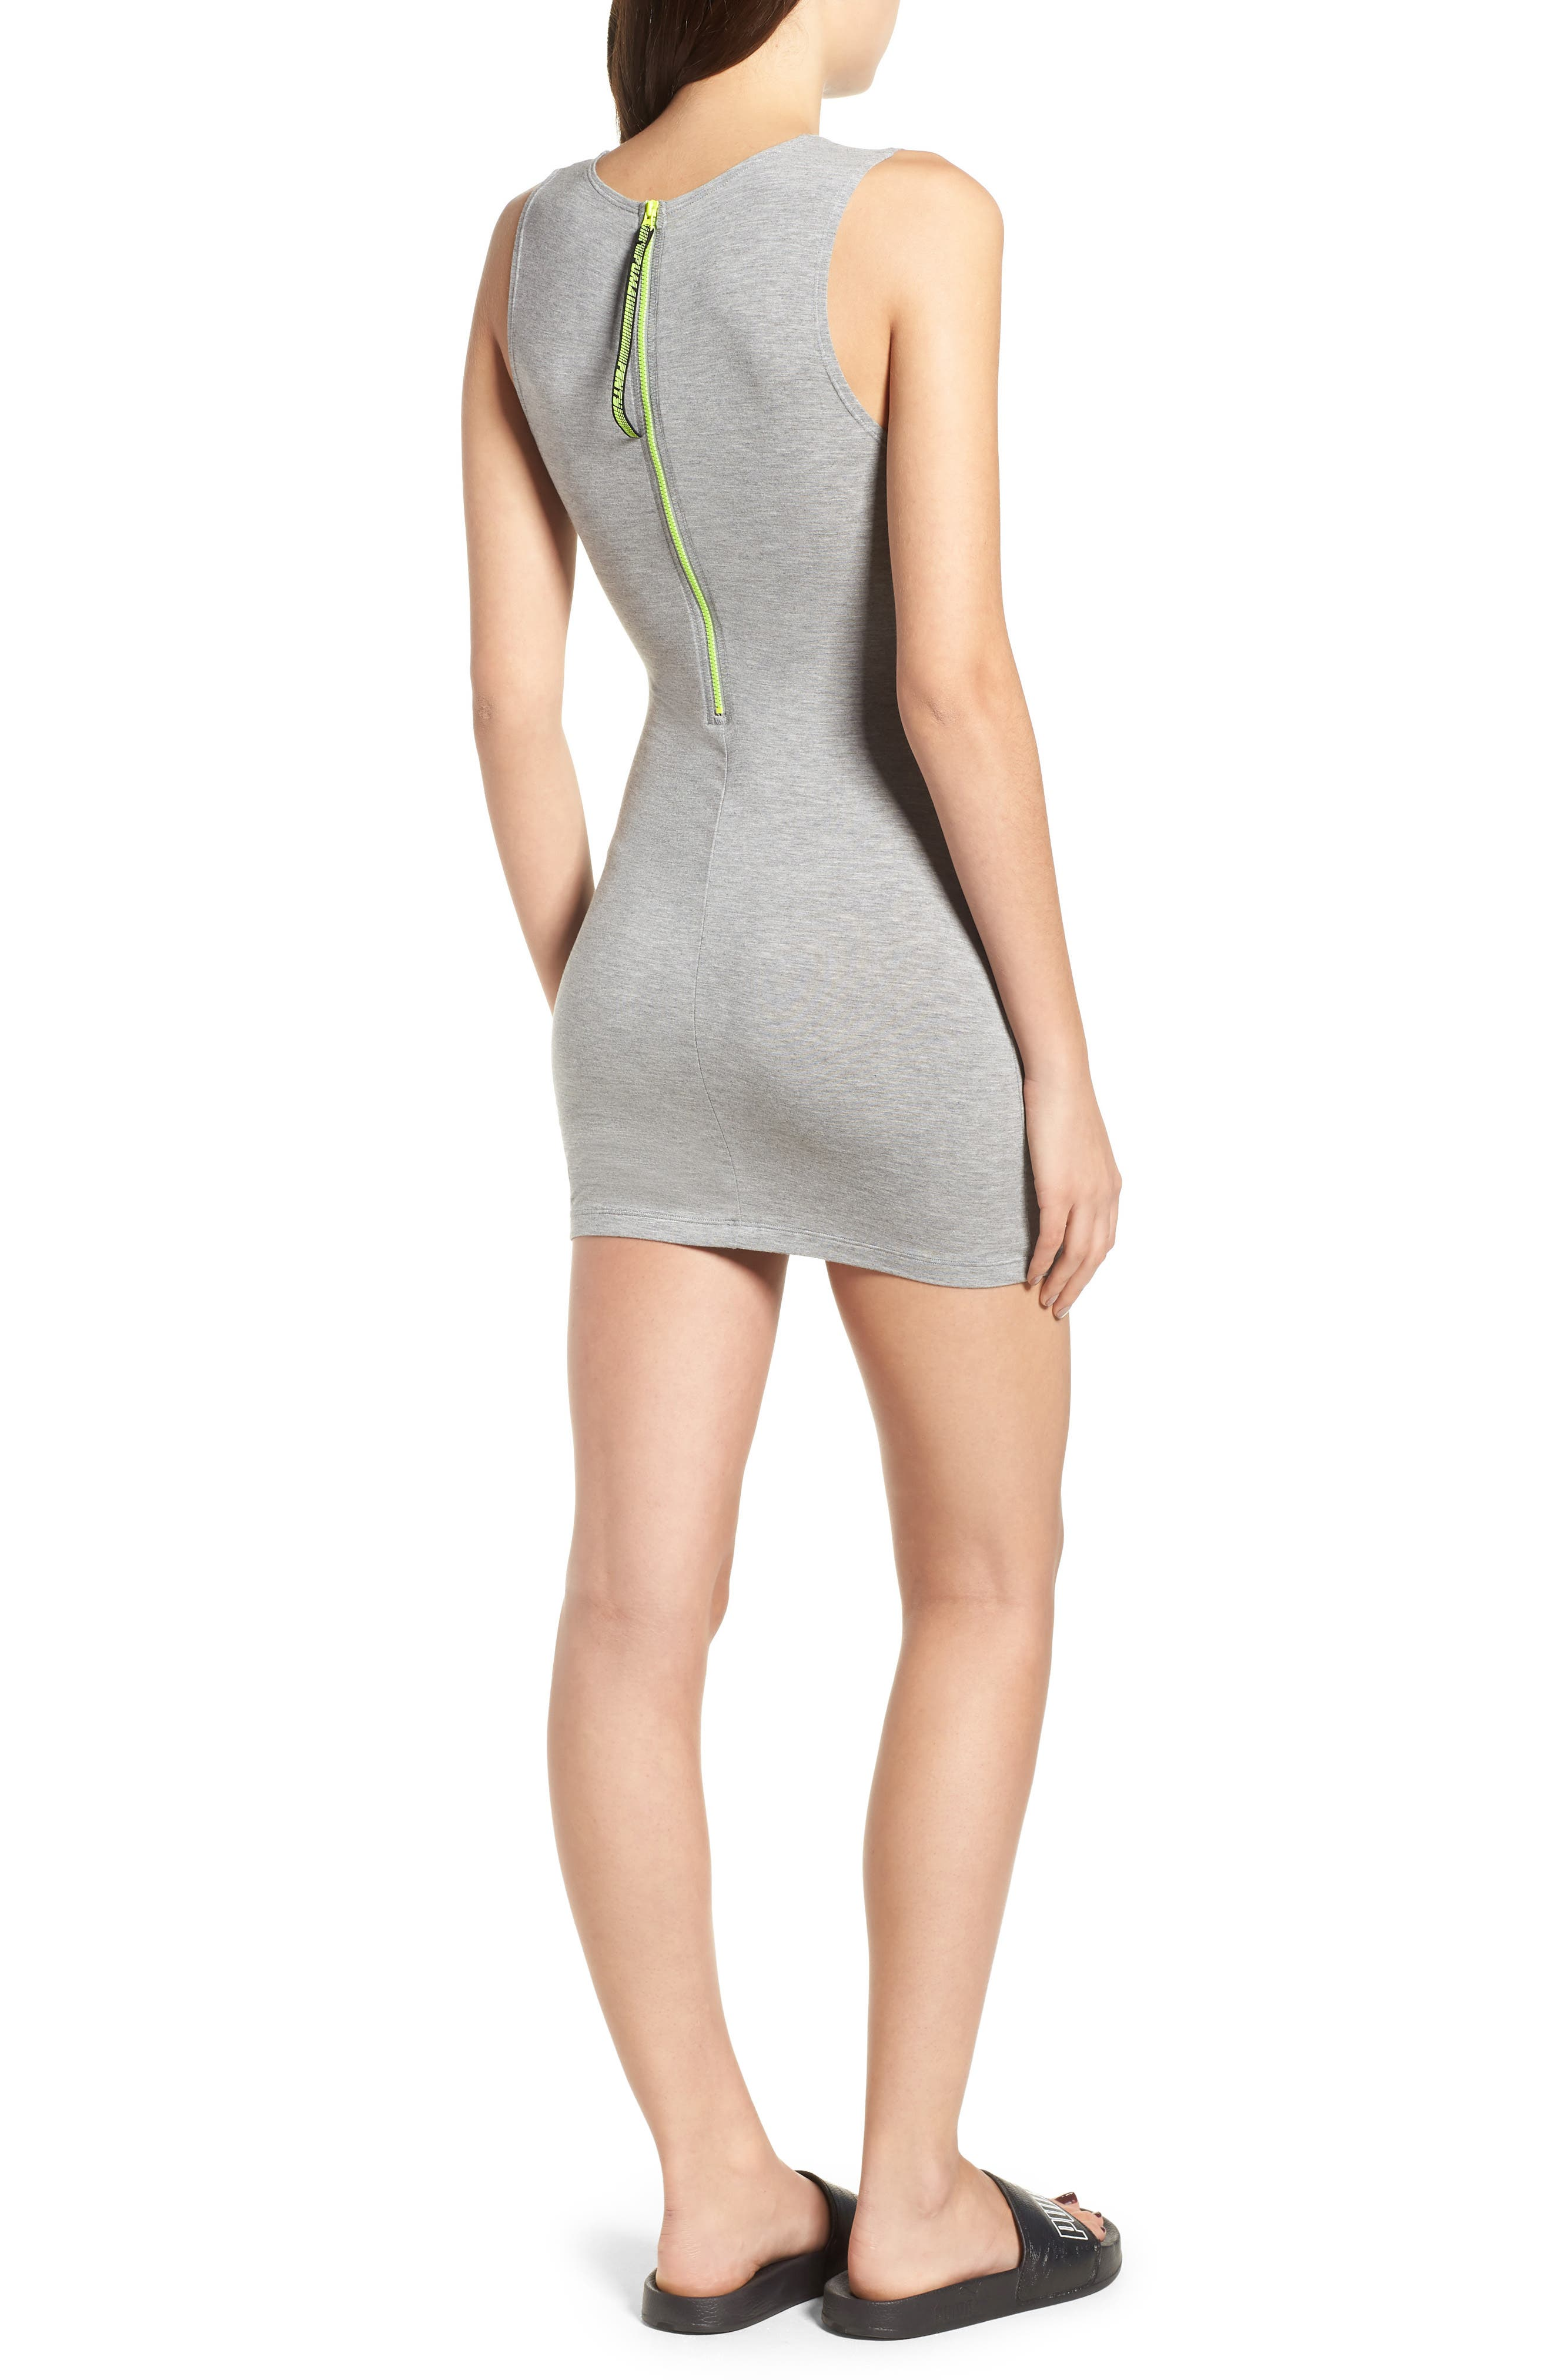 PUMA by Rihanna Body-Con Dress,                             Alternate thumbnail 2, color,                             060